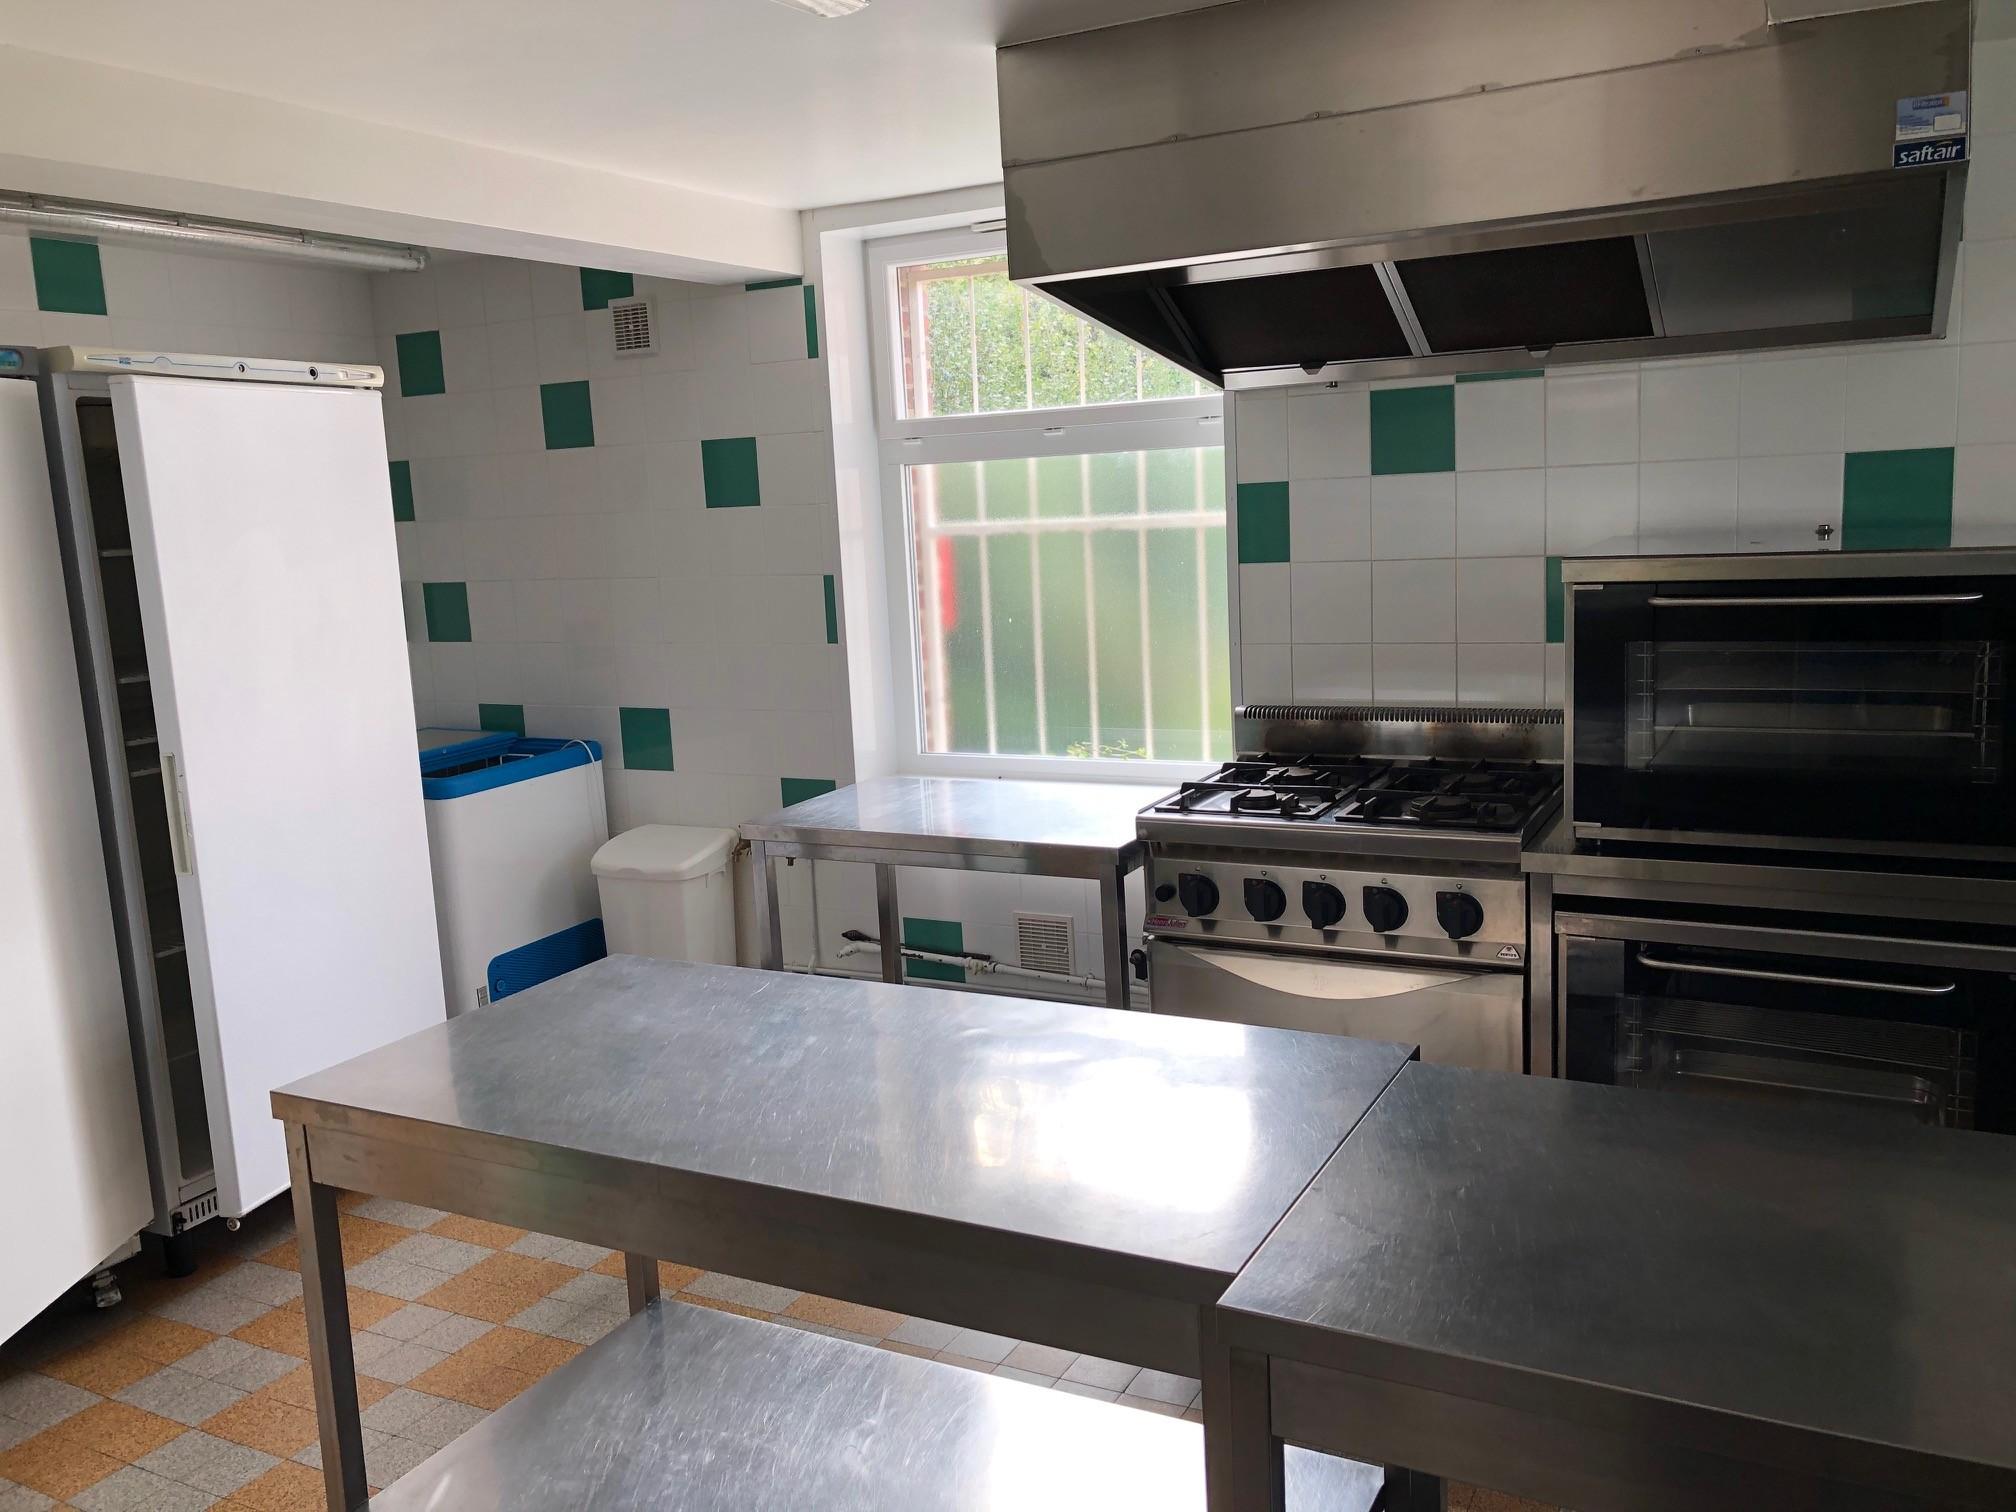 Les cuisines 2